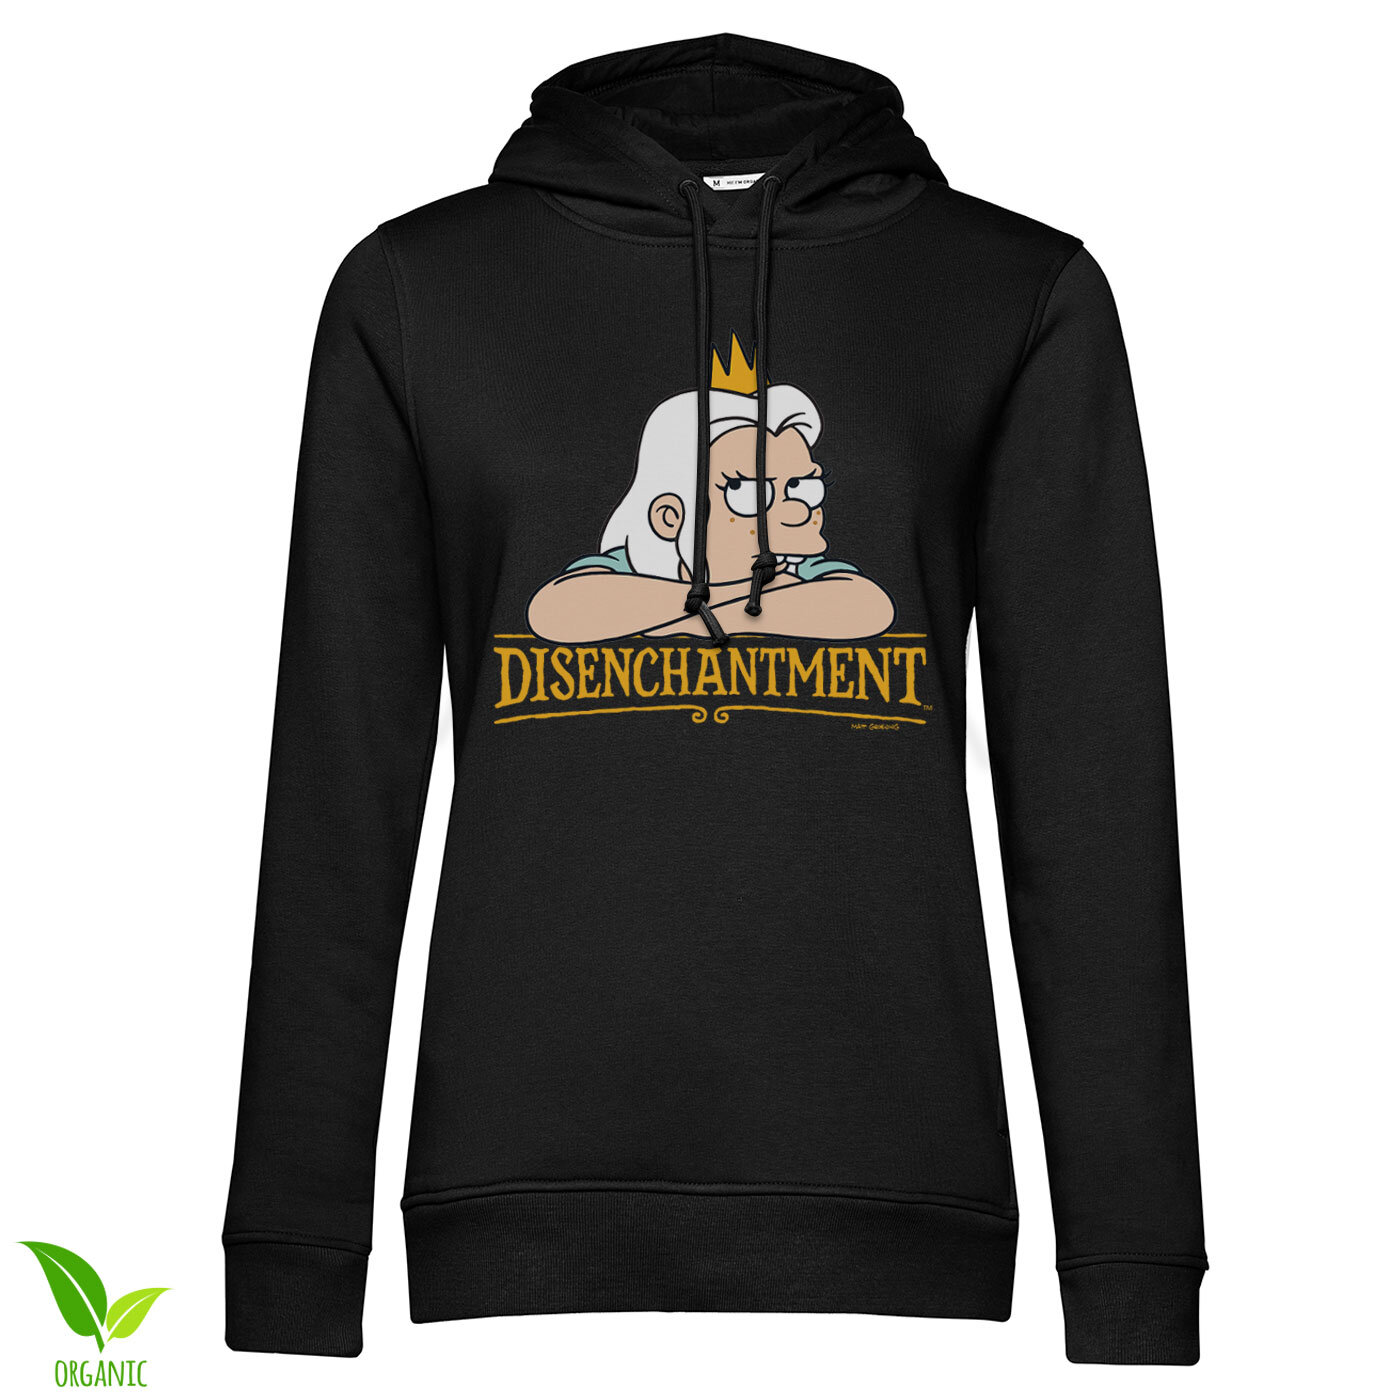 Disenchantment - Bean Girls Hoodie